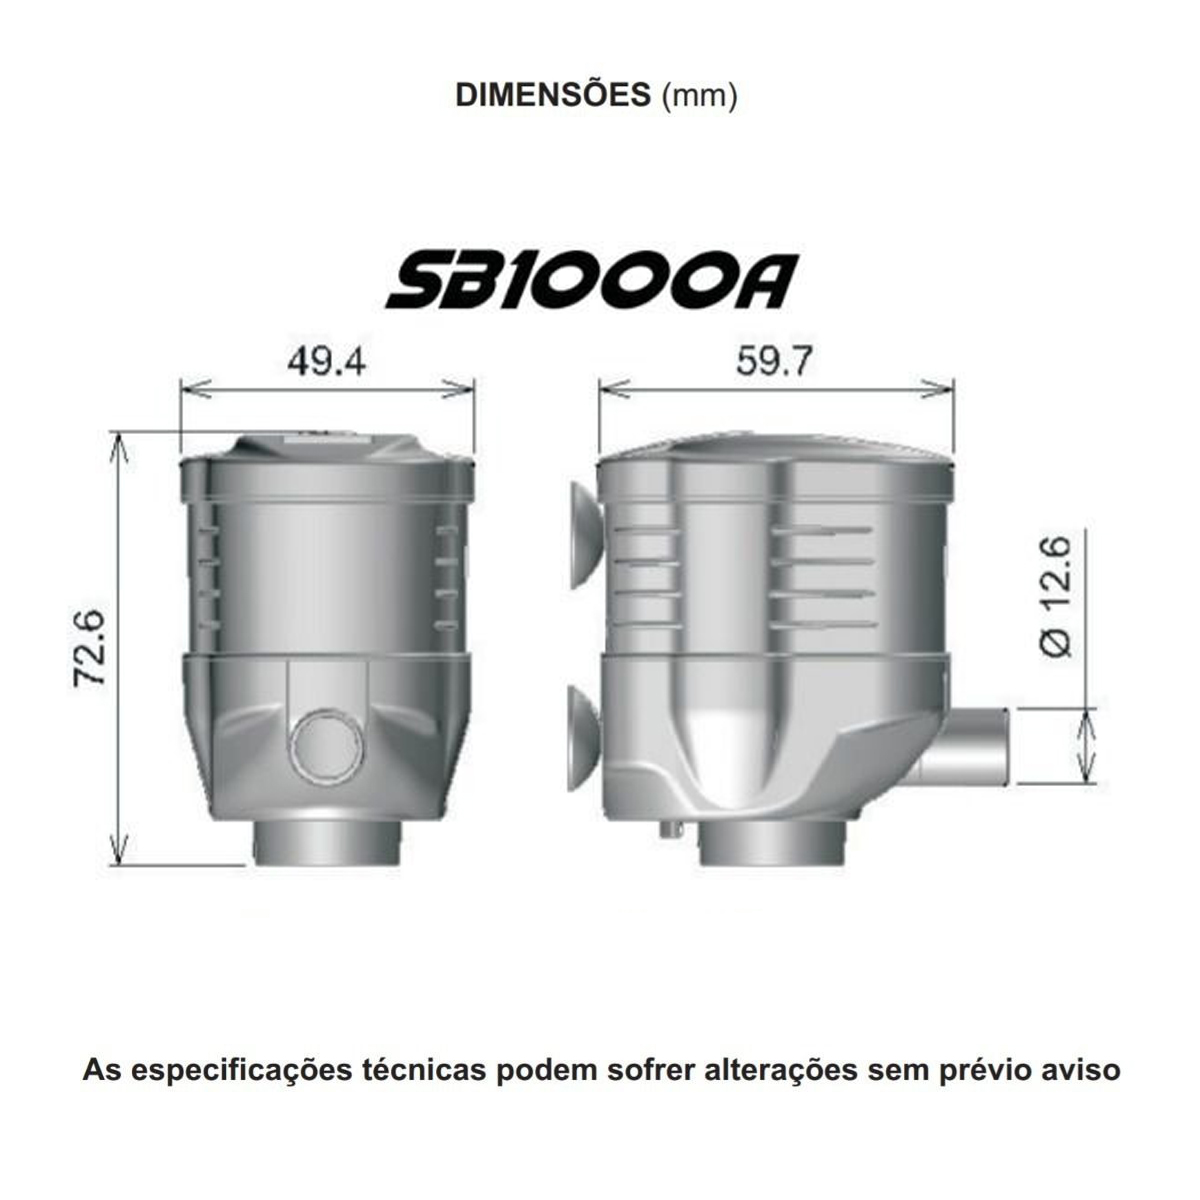 Bomba Submersa Sarlo Better SB 1000a 400 A 1000l/h 220v